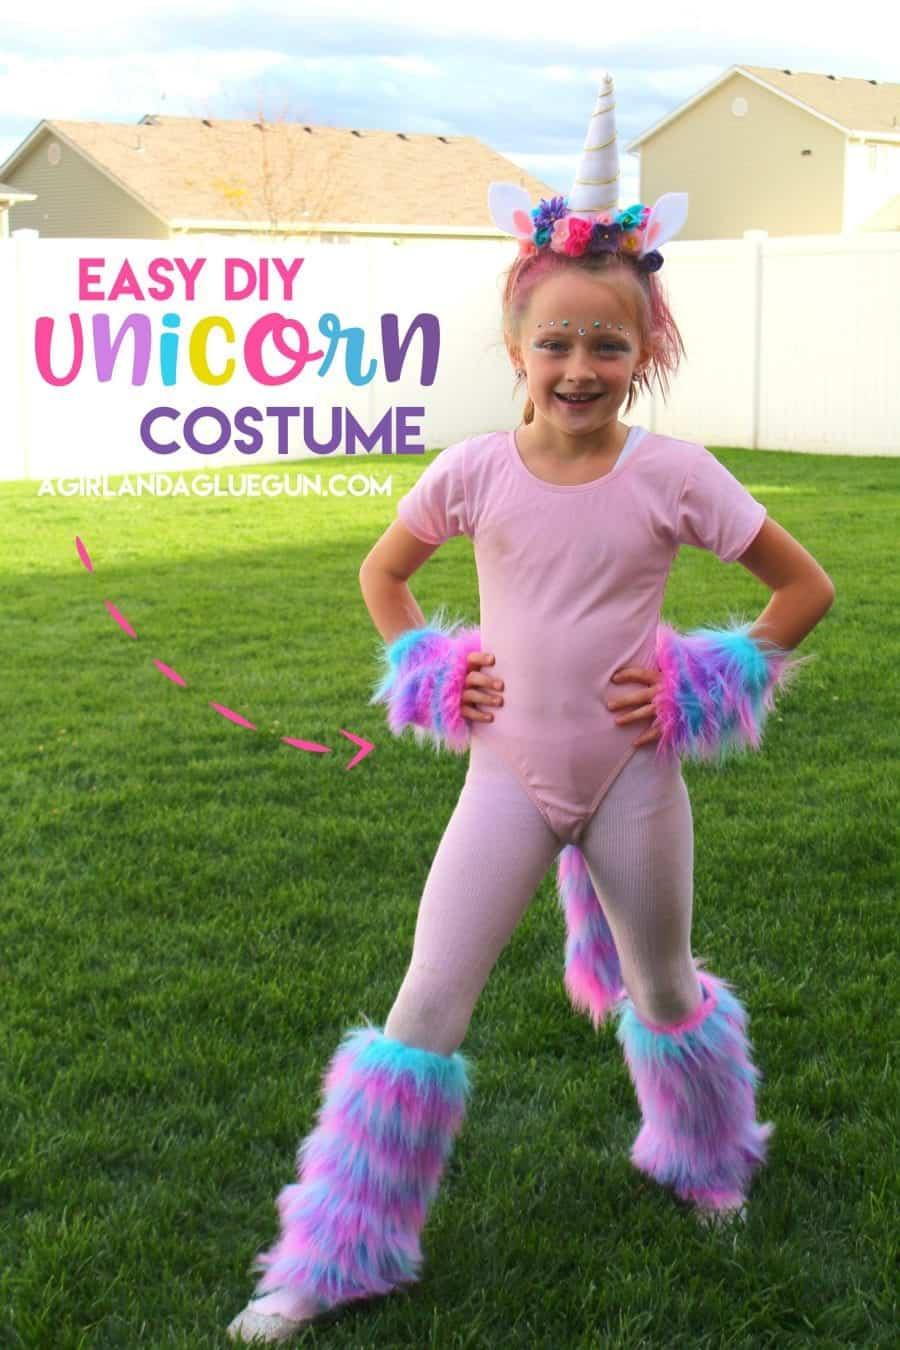 Unicorn costume diy a girl and a glue gun about the author solutioingenieria Choice Image